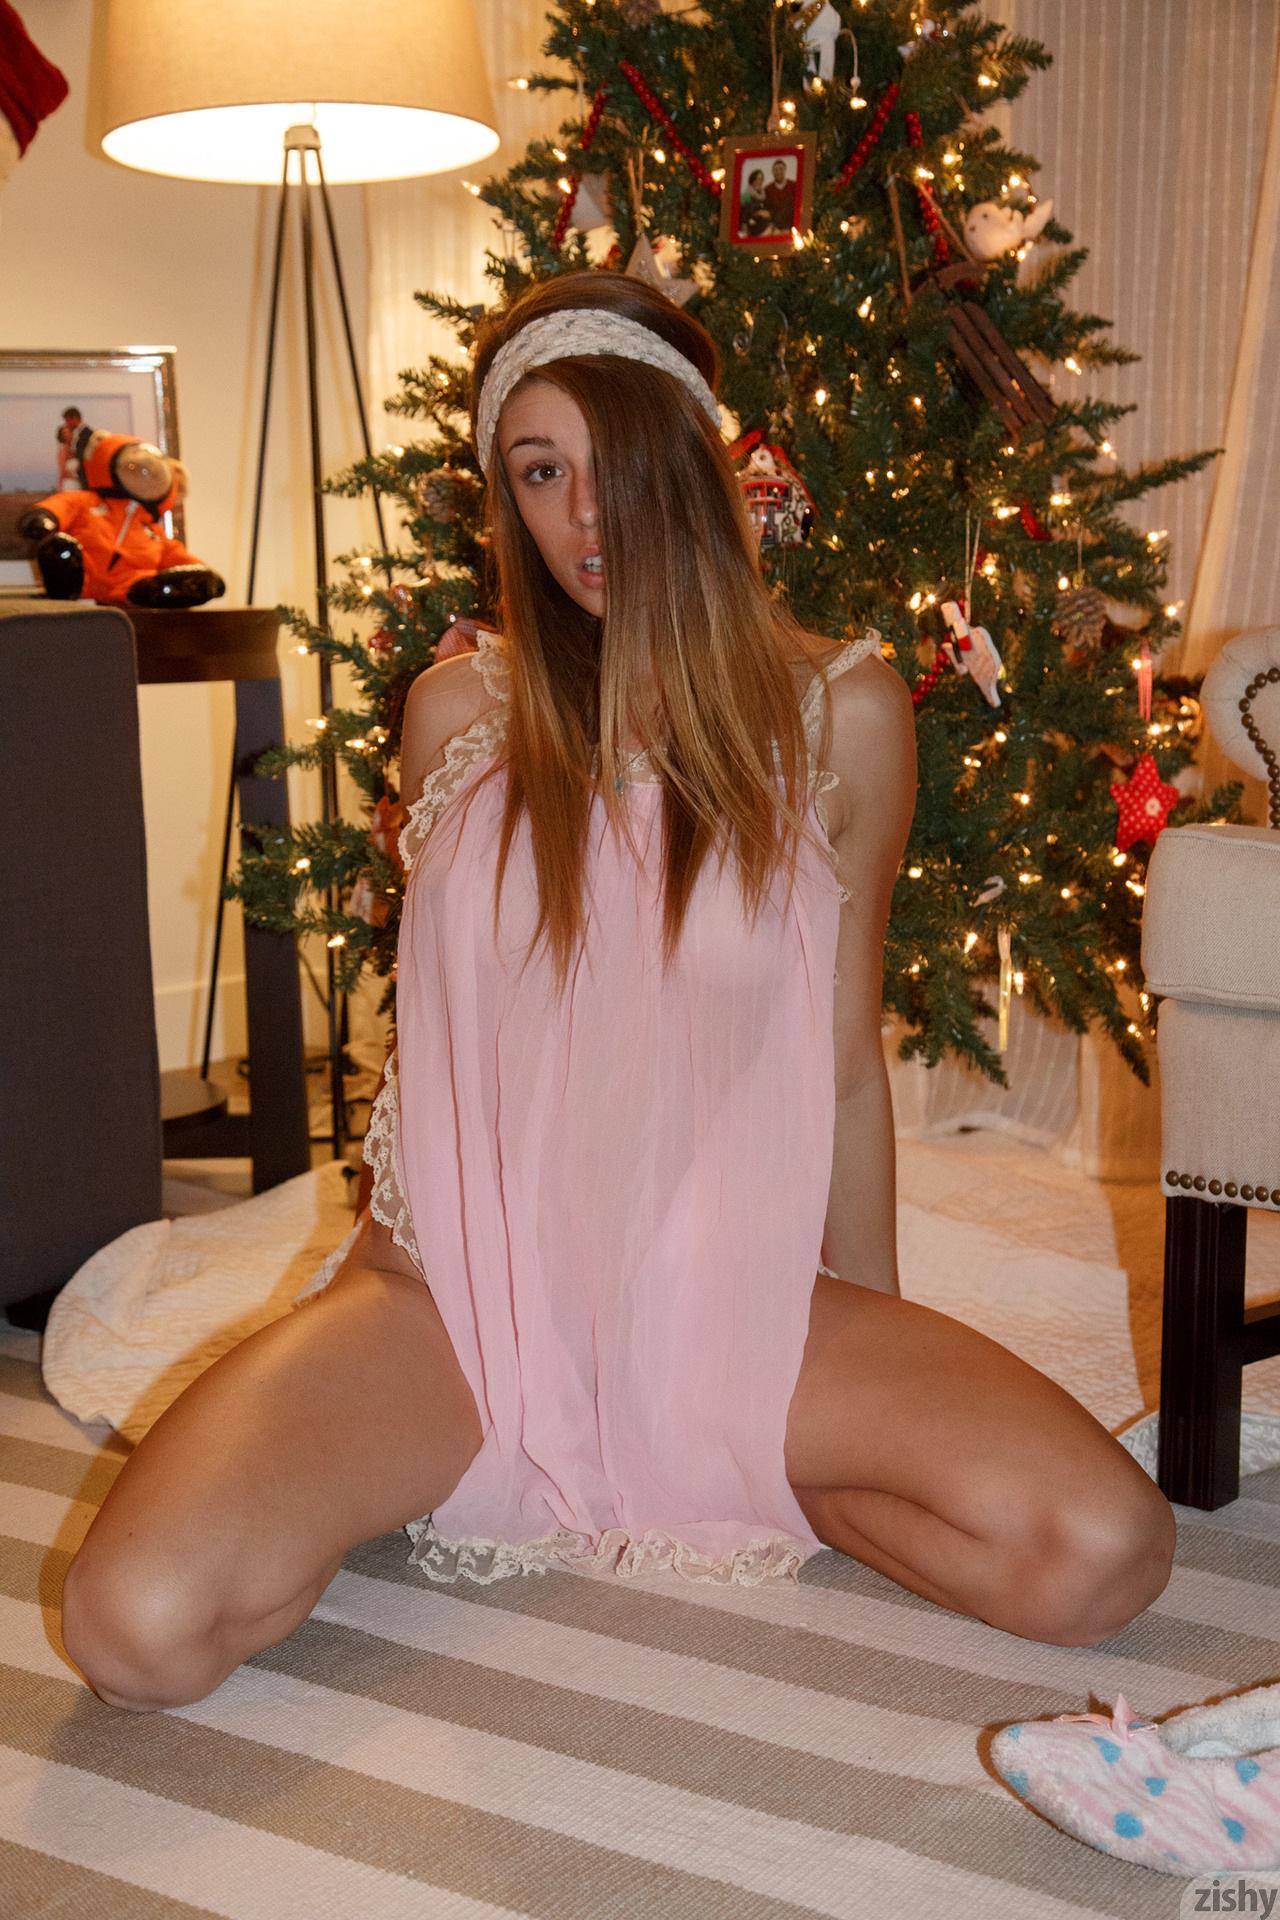 gracie-thibble-christmas-morning-boobs-zishy-18